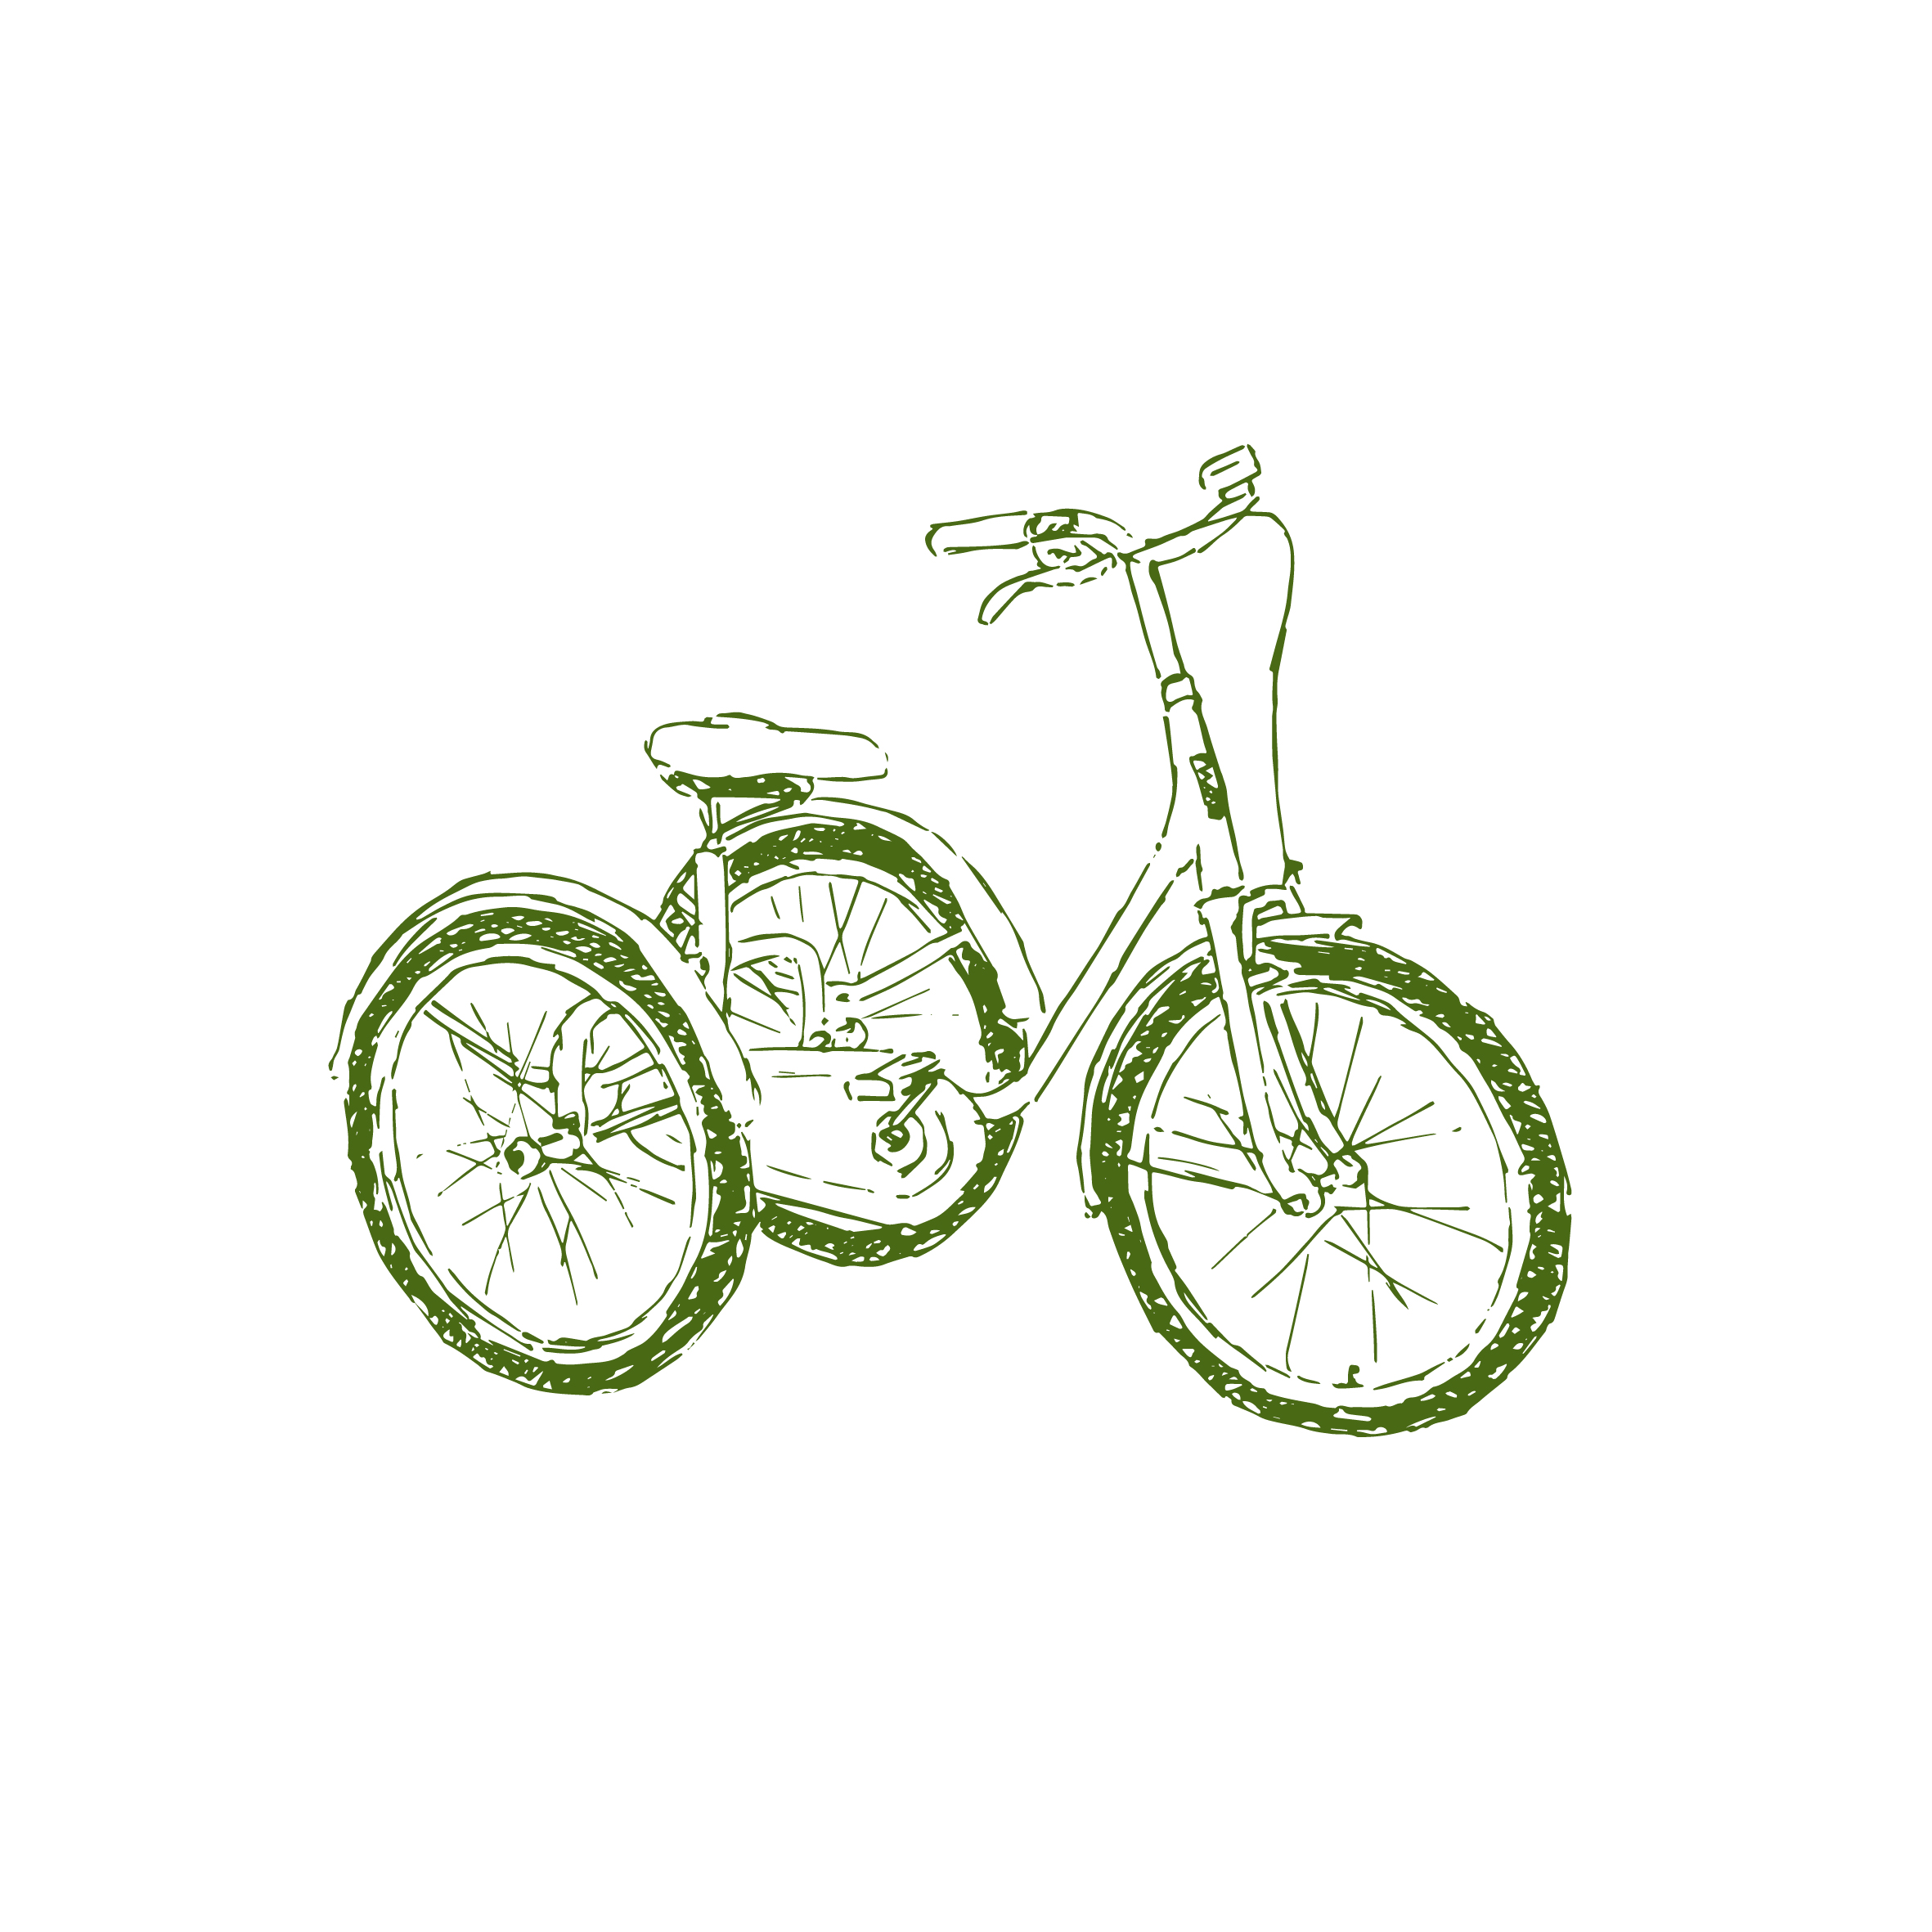 pedal car_Moss.jpg